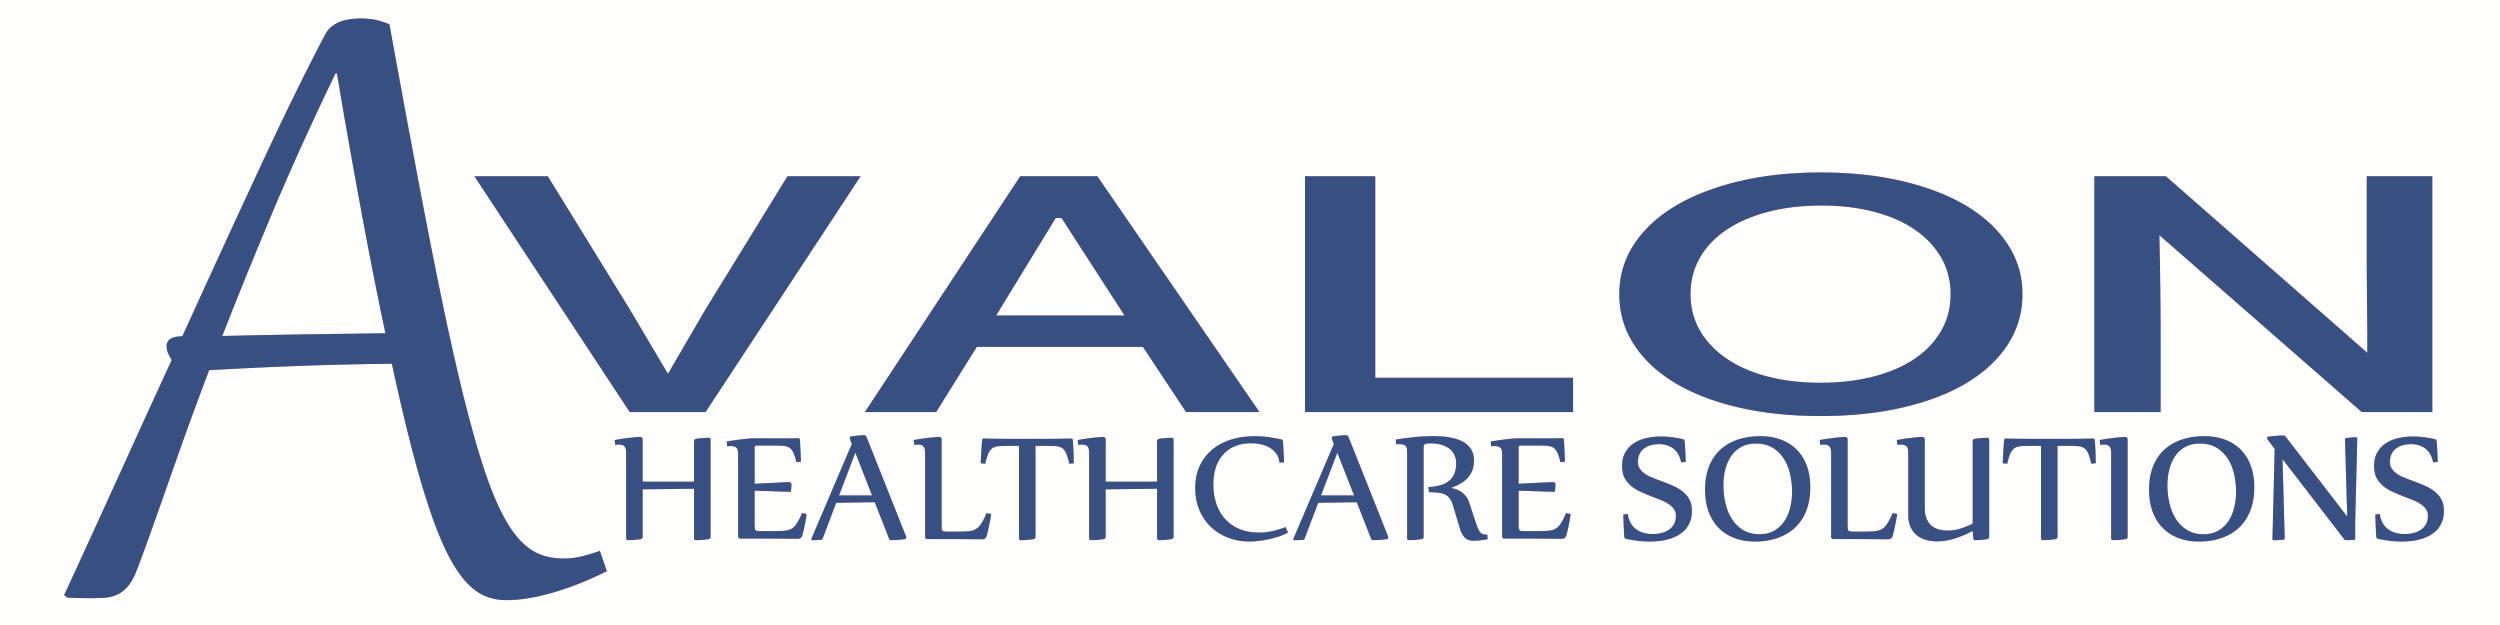 Avalon Healthcare Solutions Company Logo